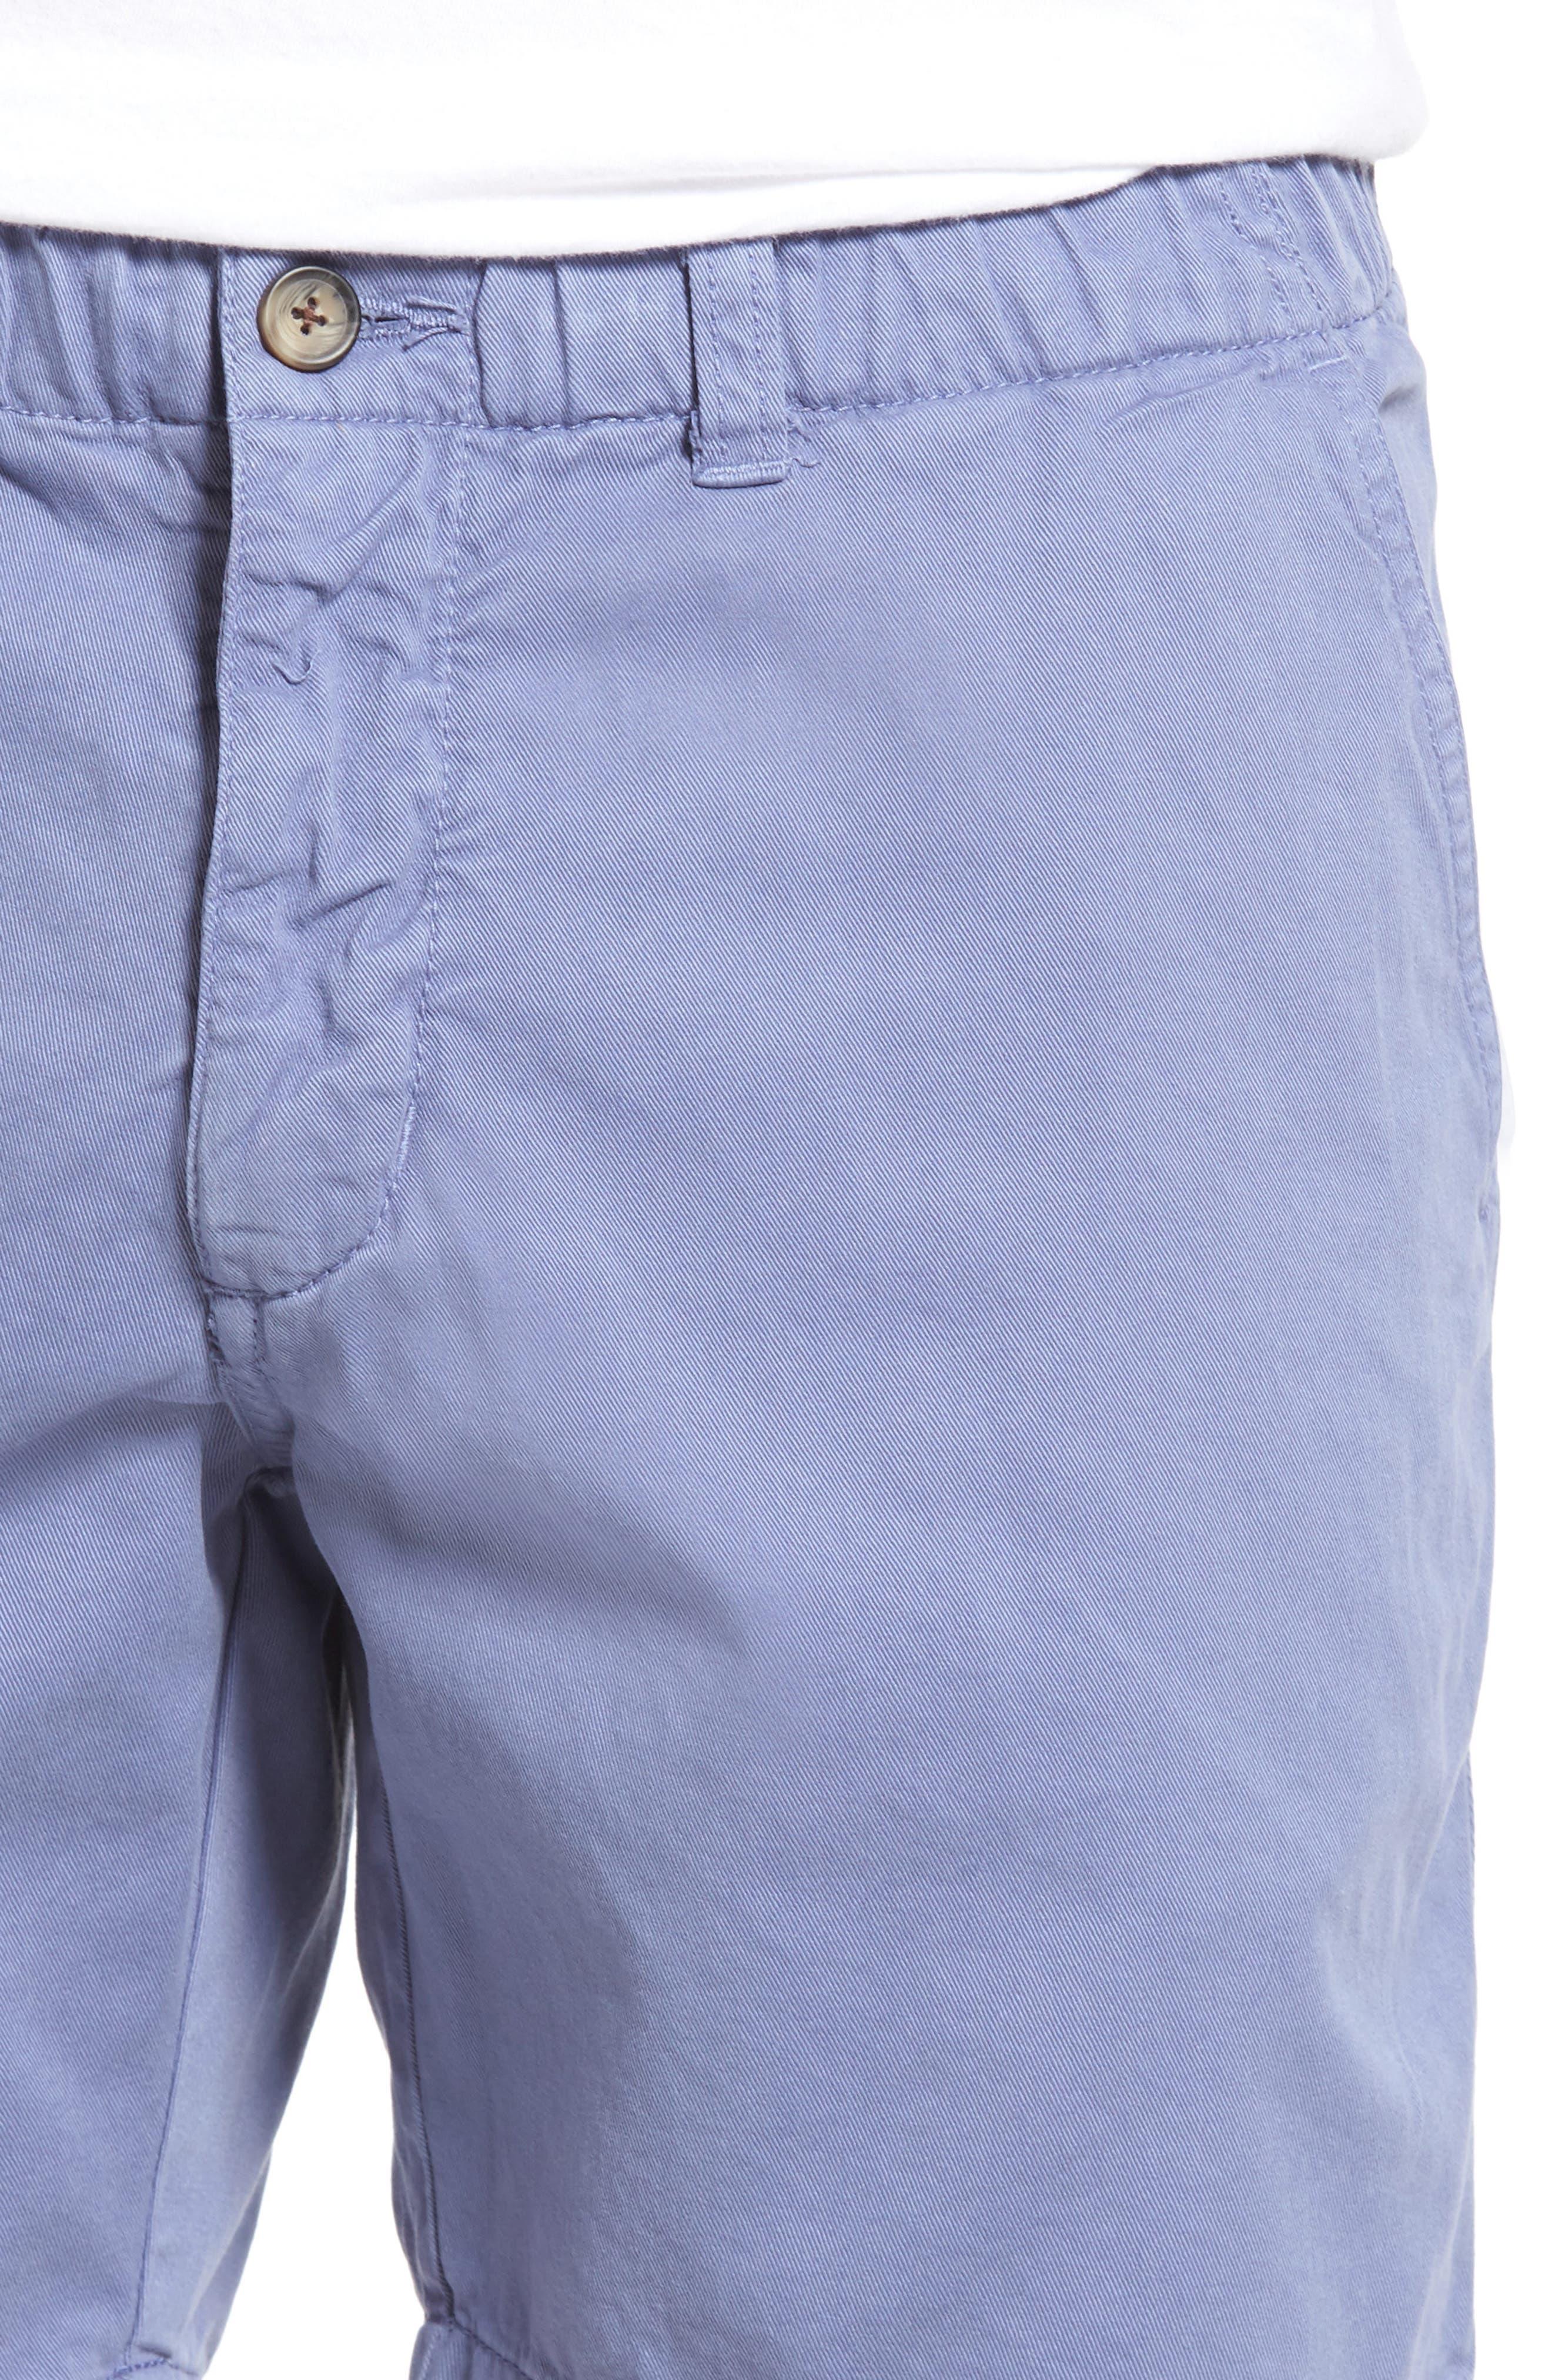 Washed Shorts,                             Alternate thumbnail 23, color,